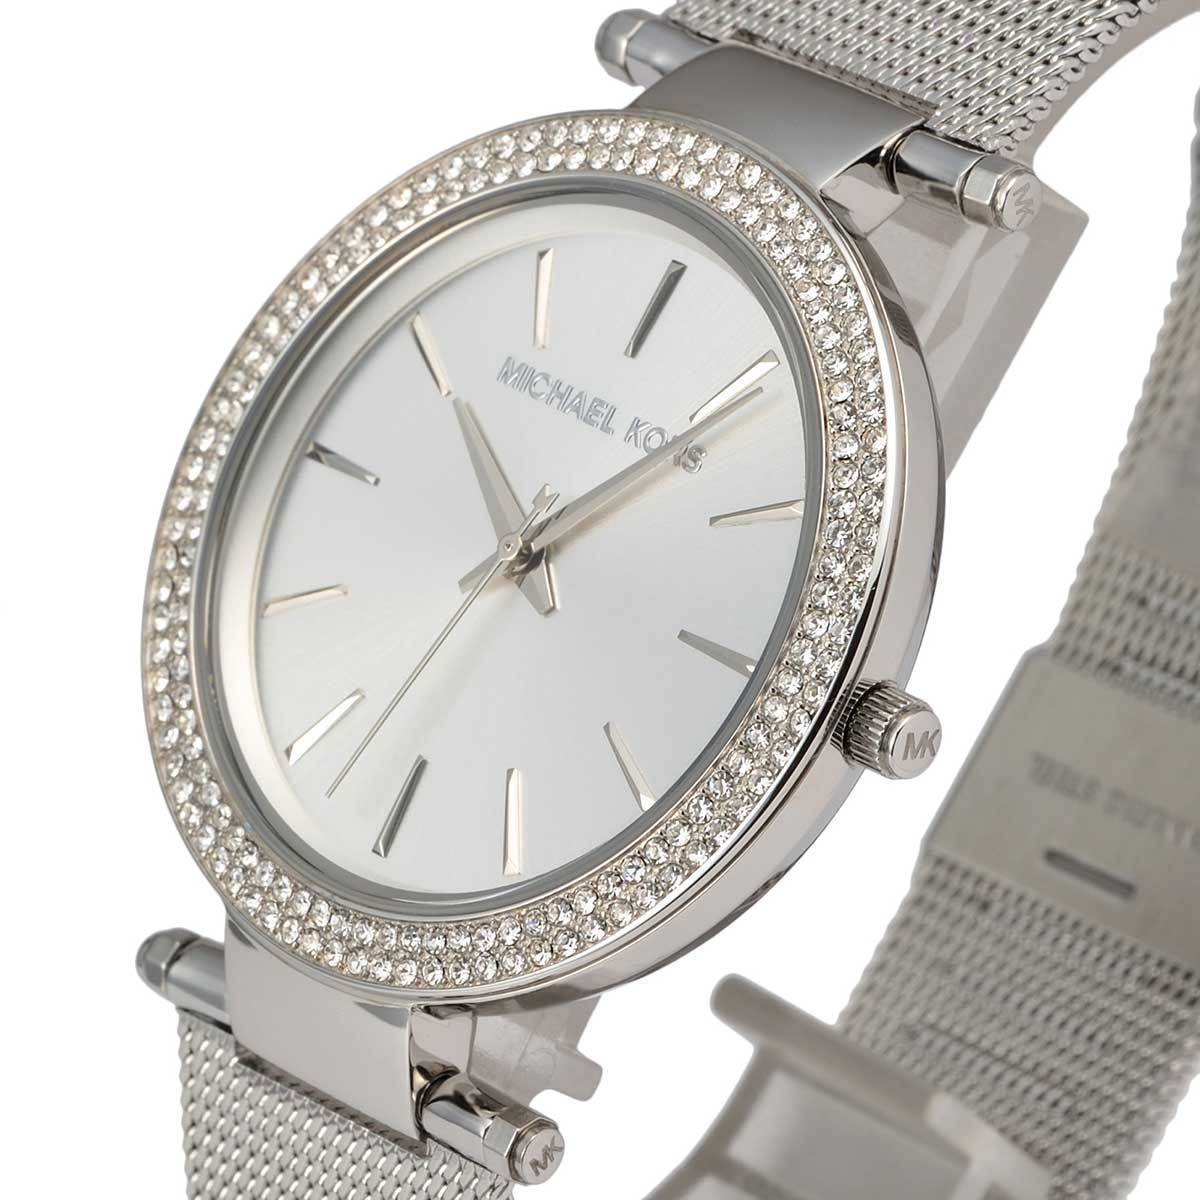 2e86ae8f35a3 100% New Michael Kors Silver Darci Stainless Steel Bracelet Women s Watch  MK3367